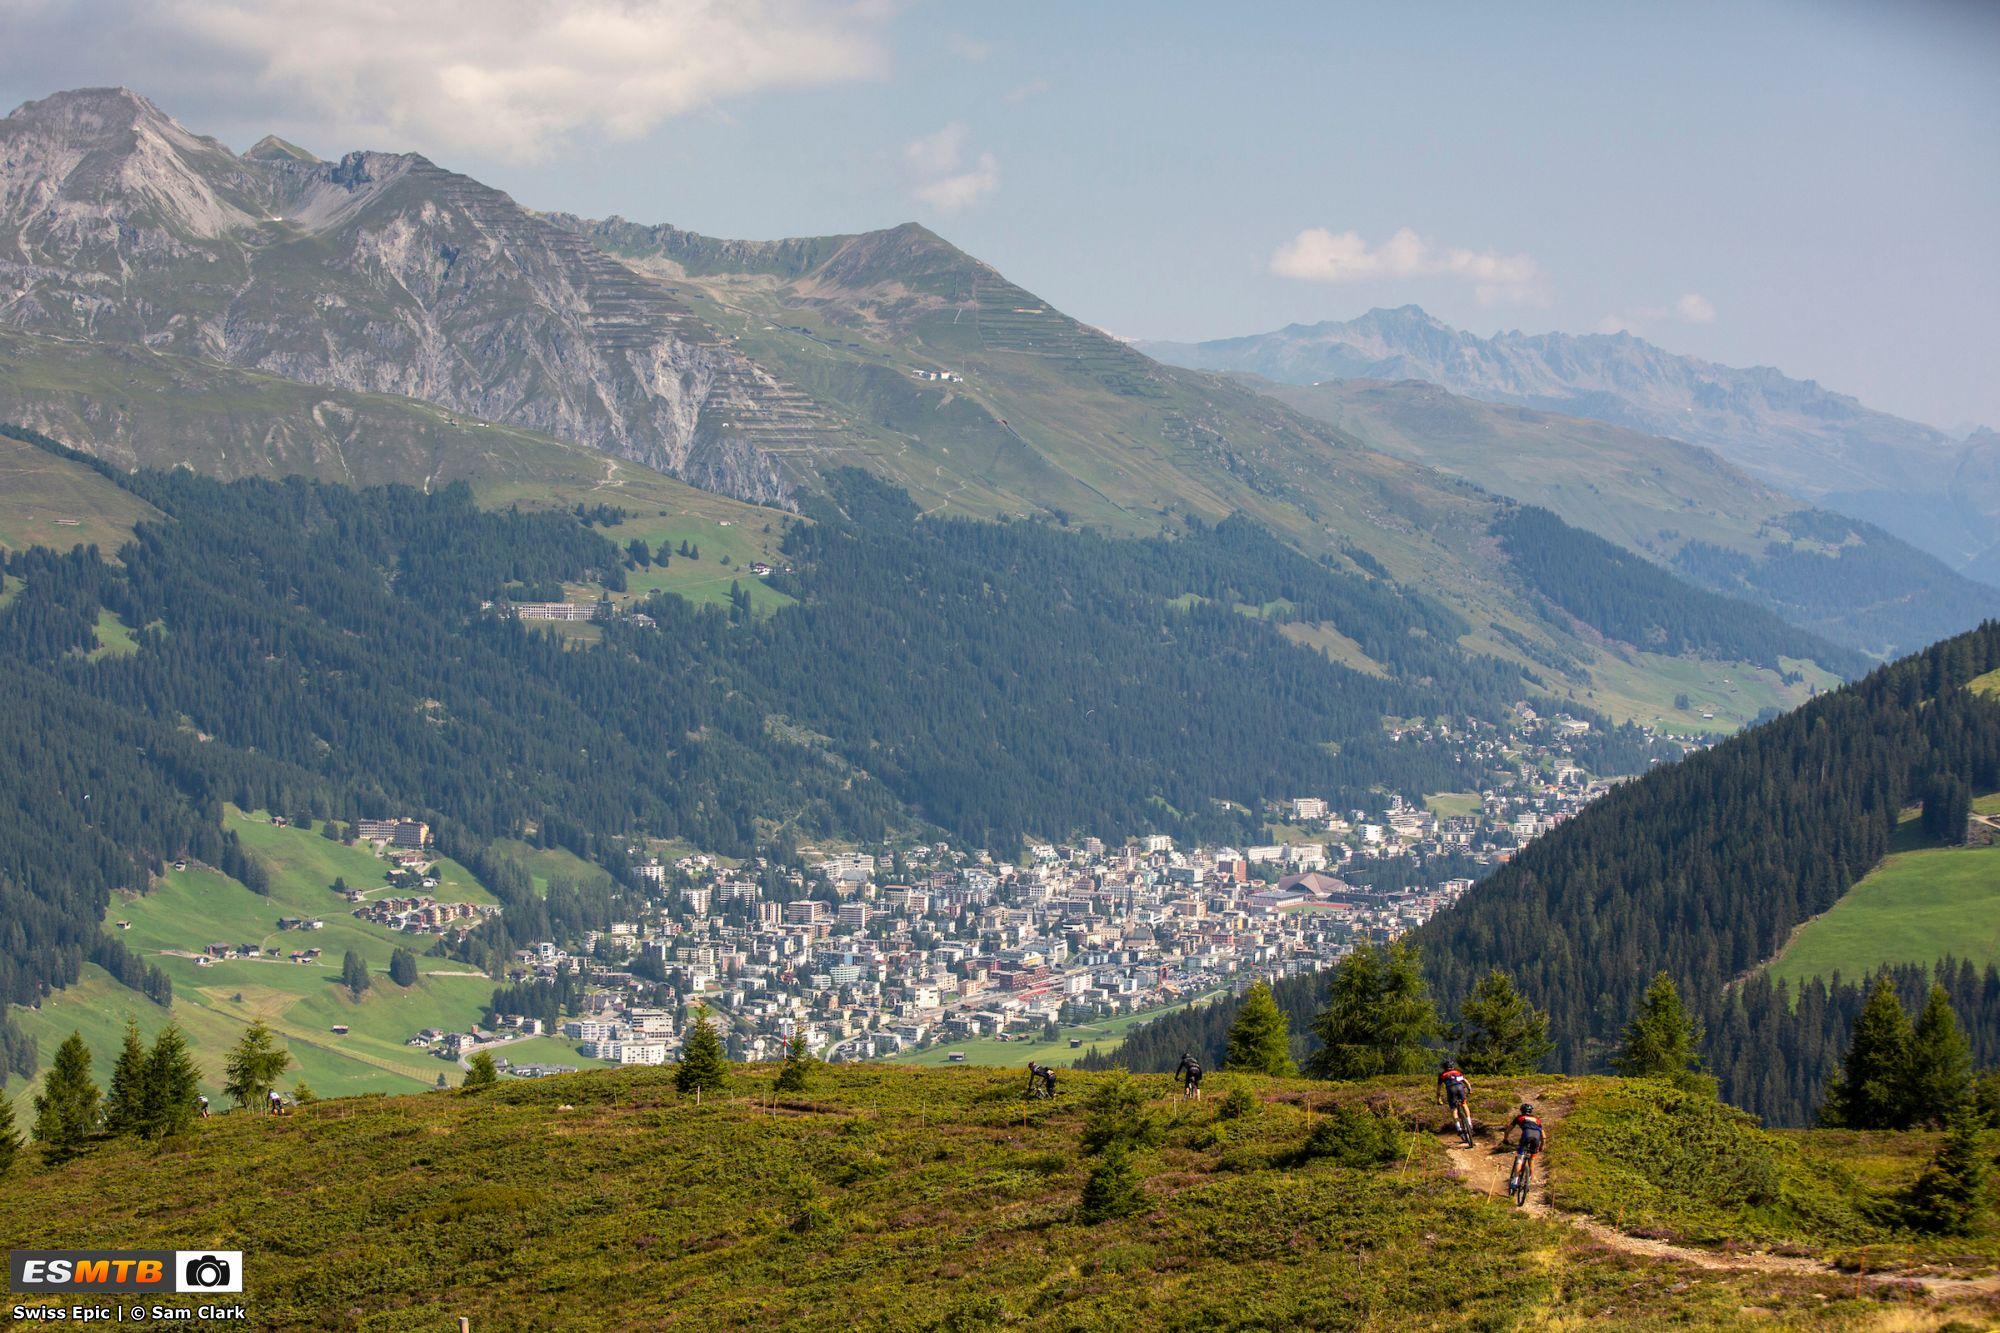 Swiss Epic | © Sam Clark